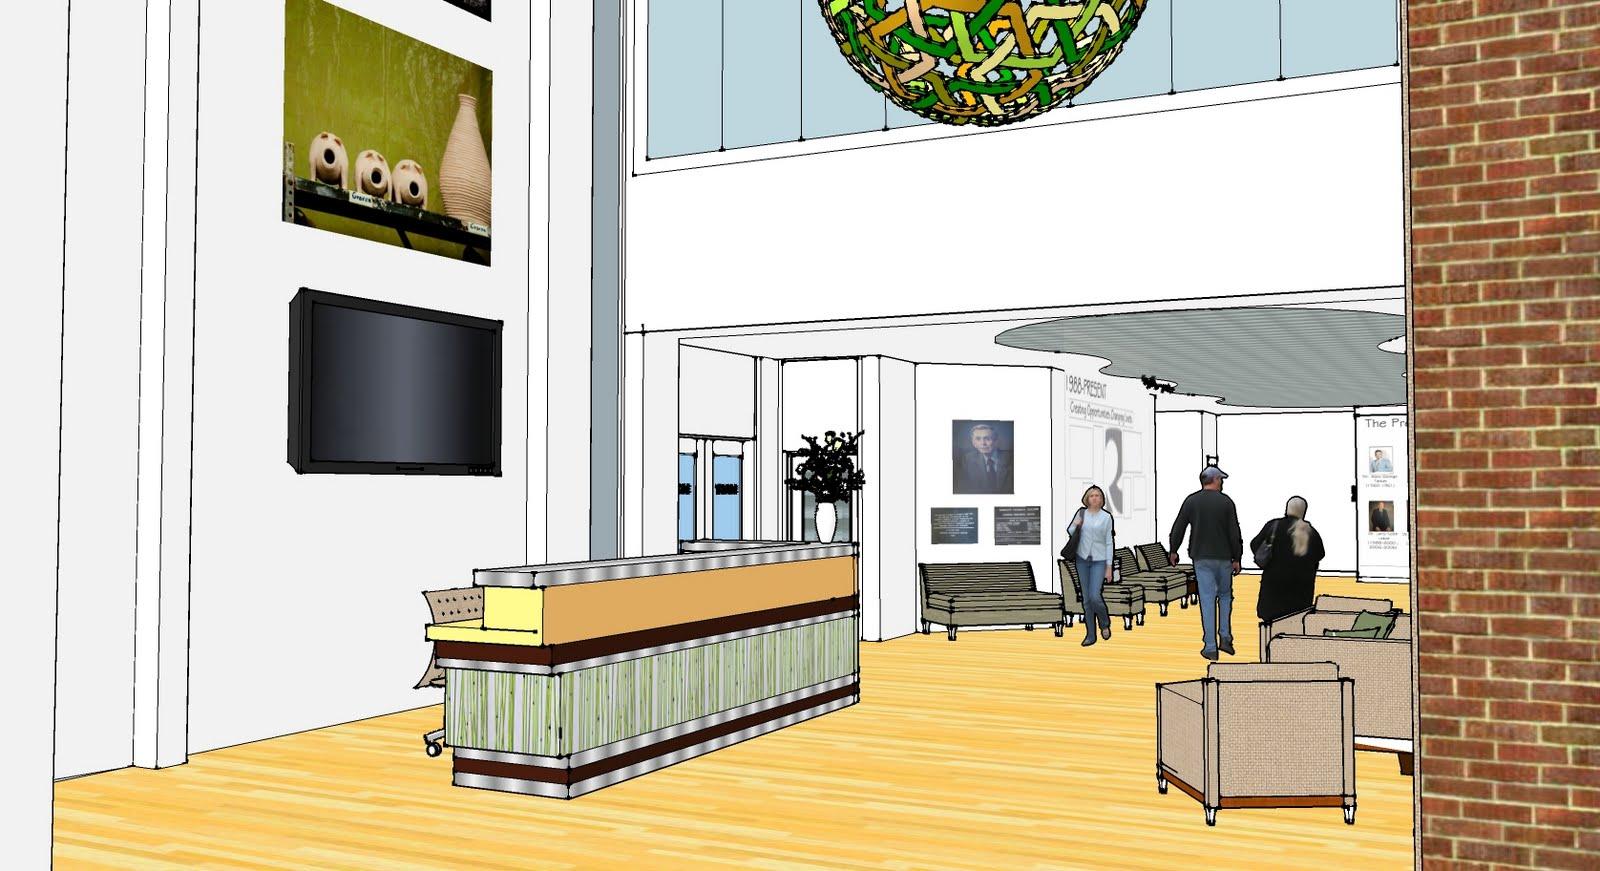 Randolph Community College Interior Design Concepts Presented for